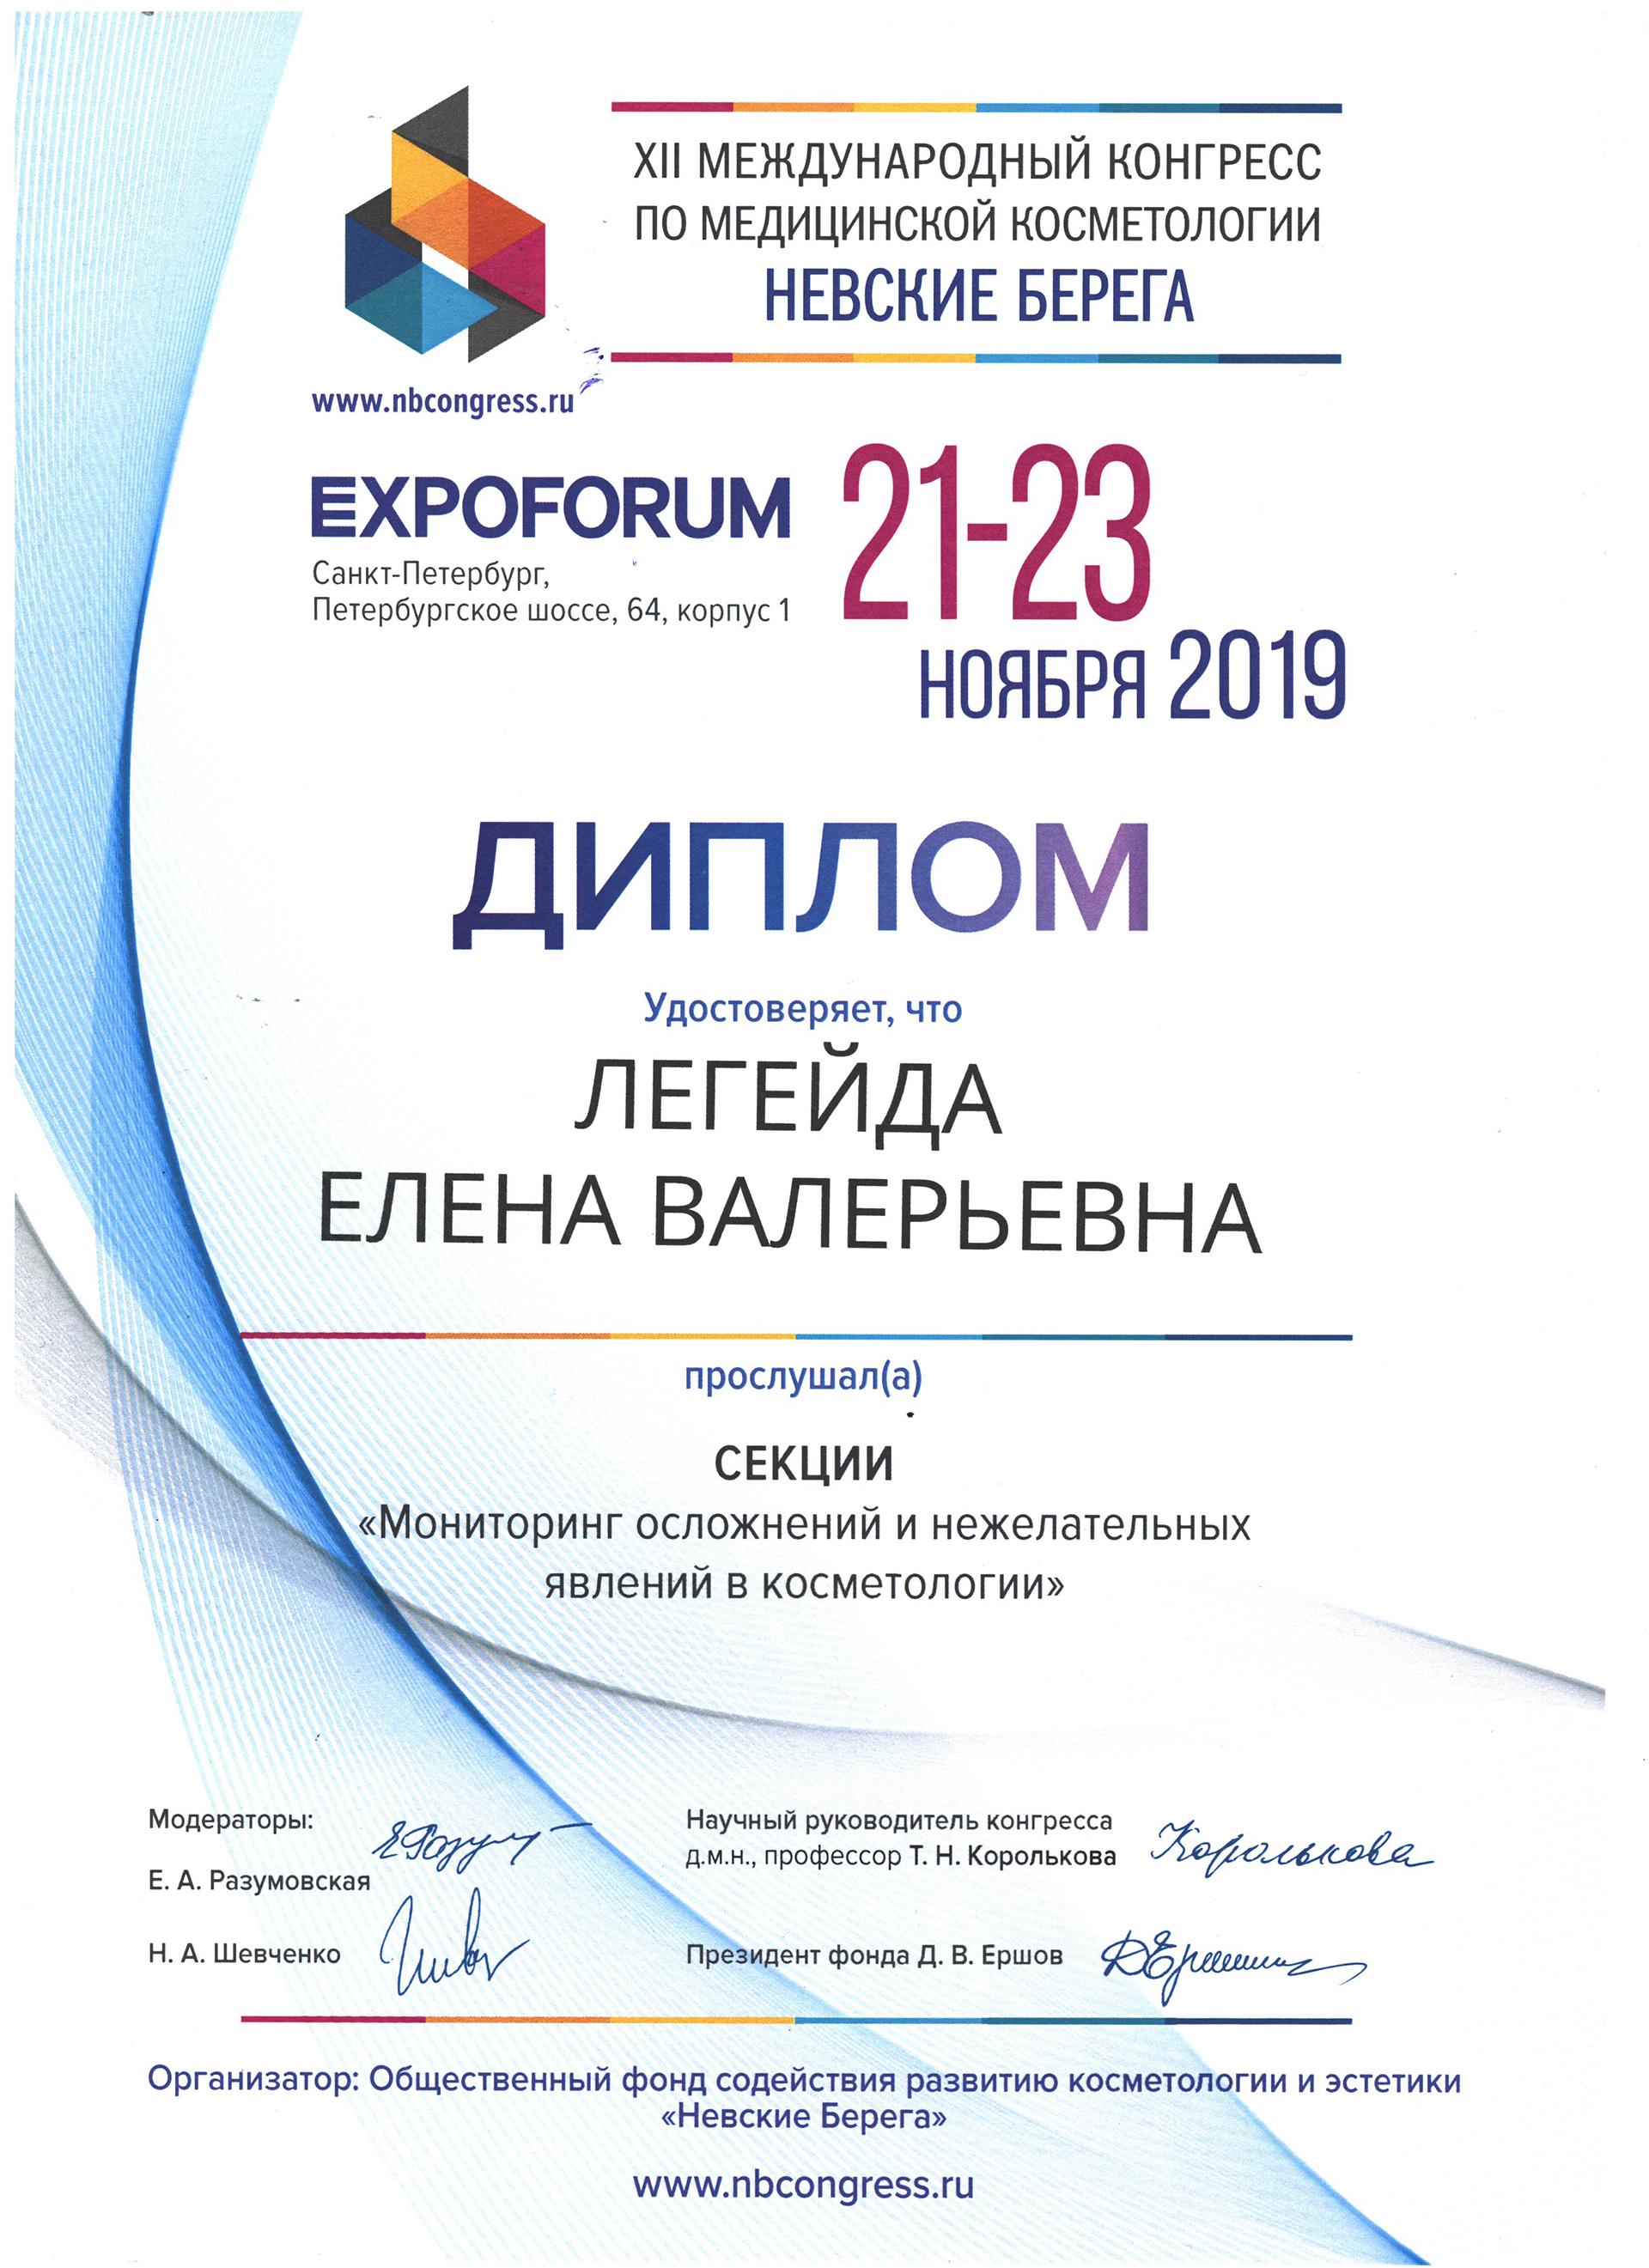 Сертификат — Expoforum. Легейда Елена Валерьевна